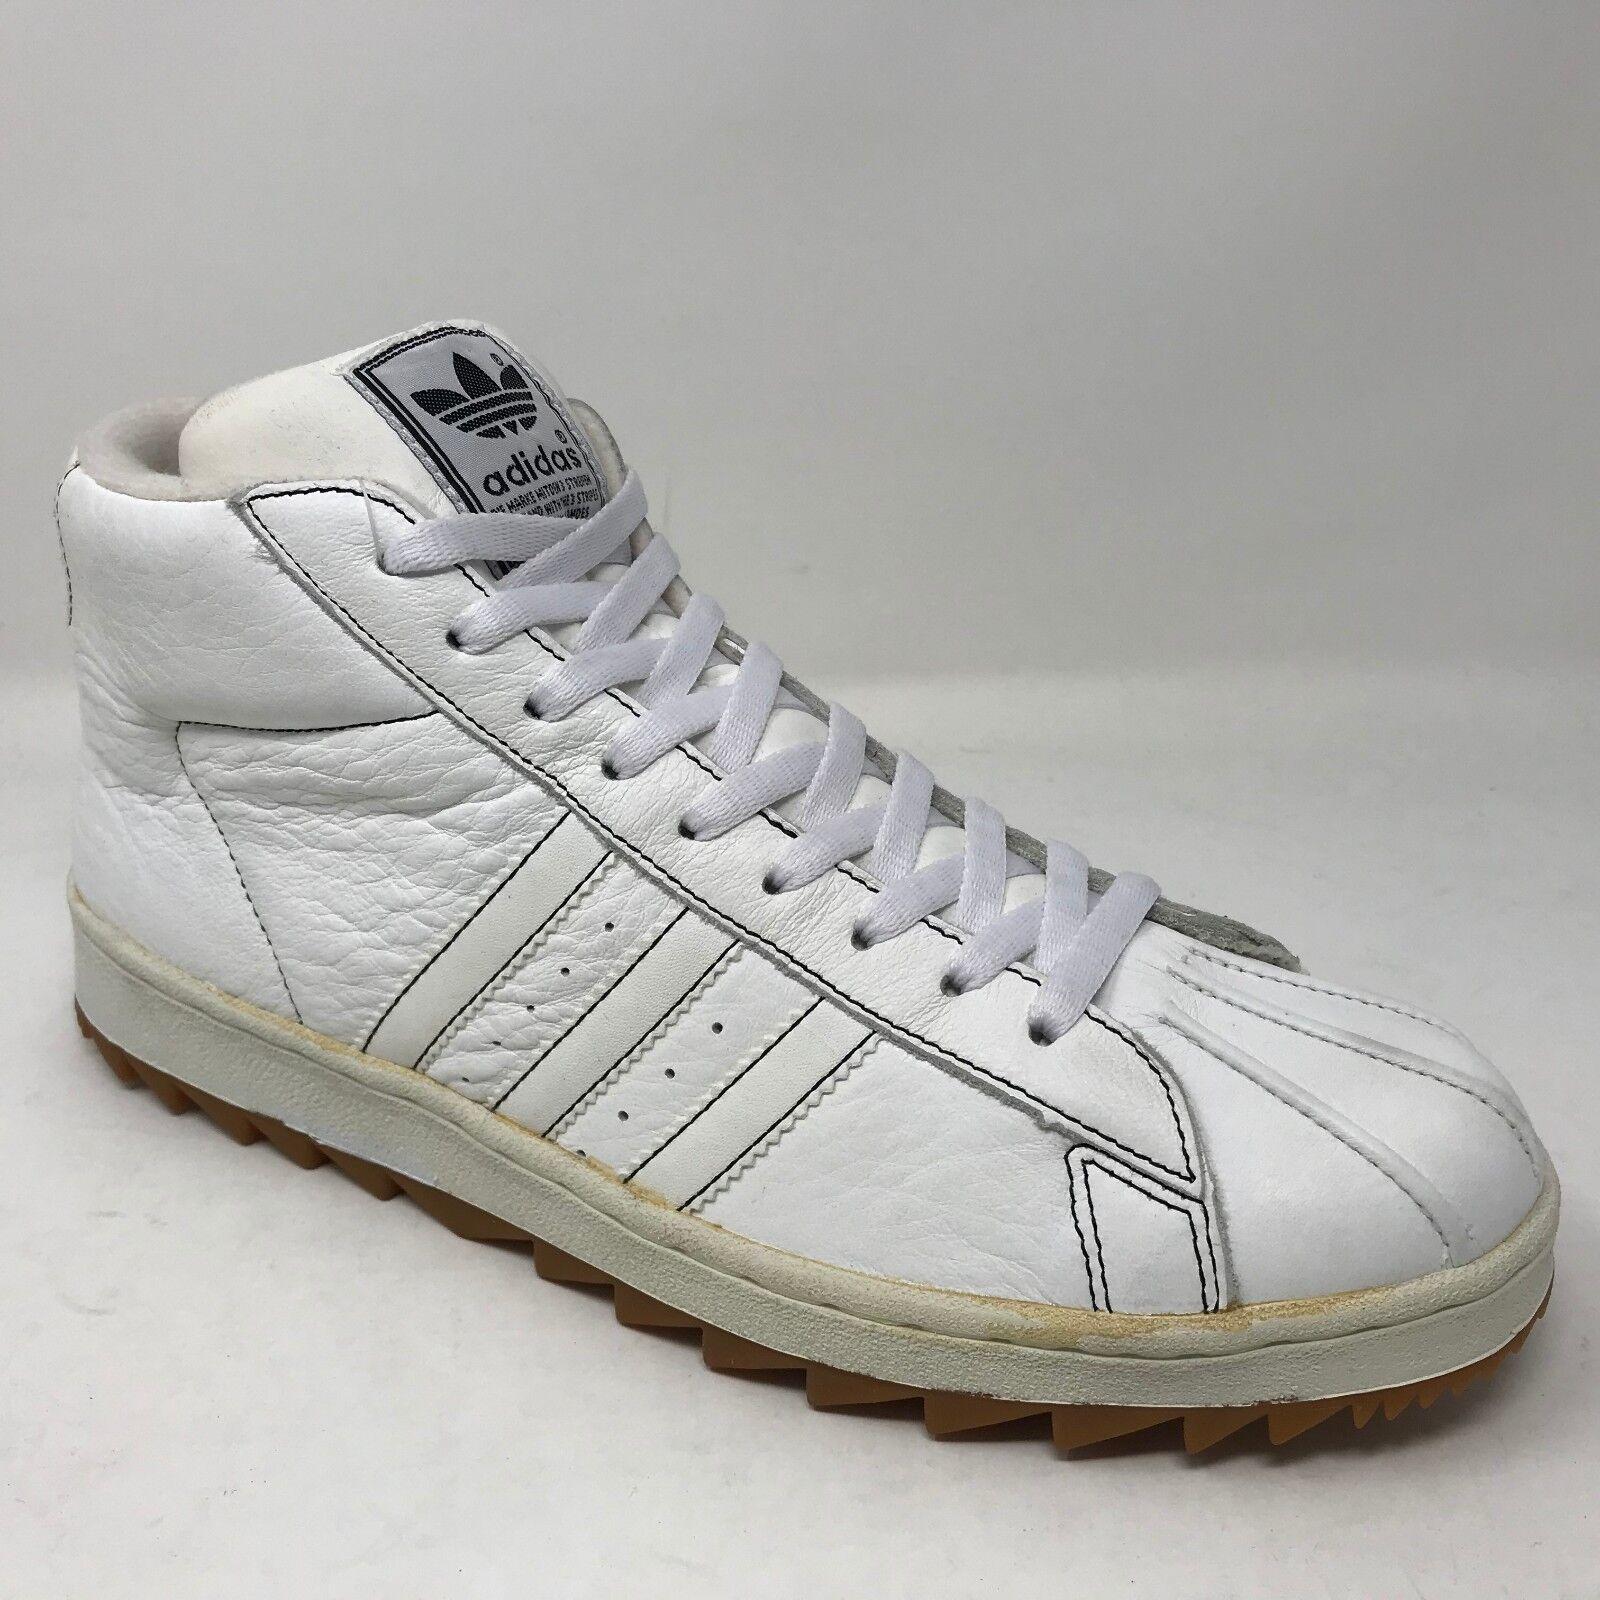 La nuova annata uomini adidas promodel ripple 1 ga basket scarpa 079025 dimensioni 10,5